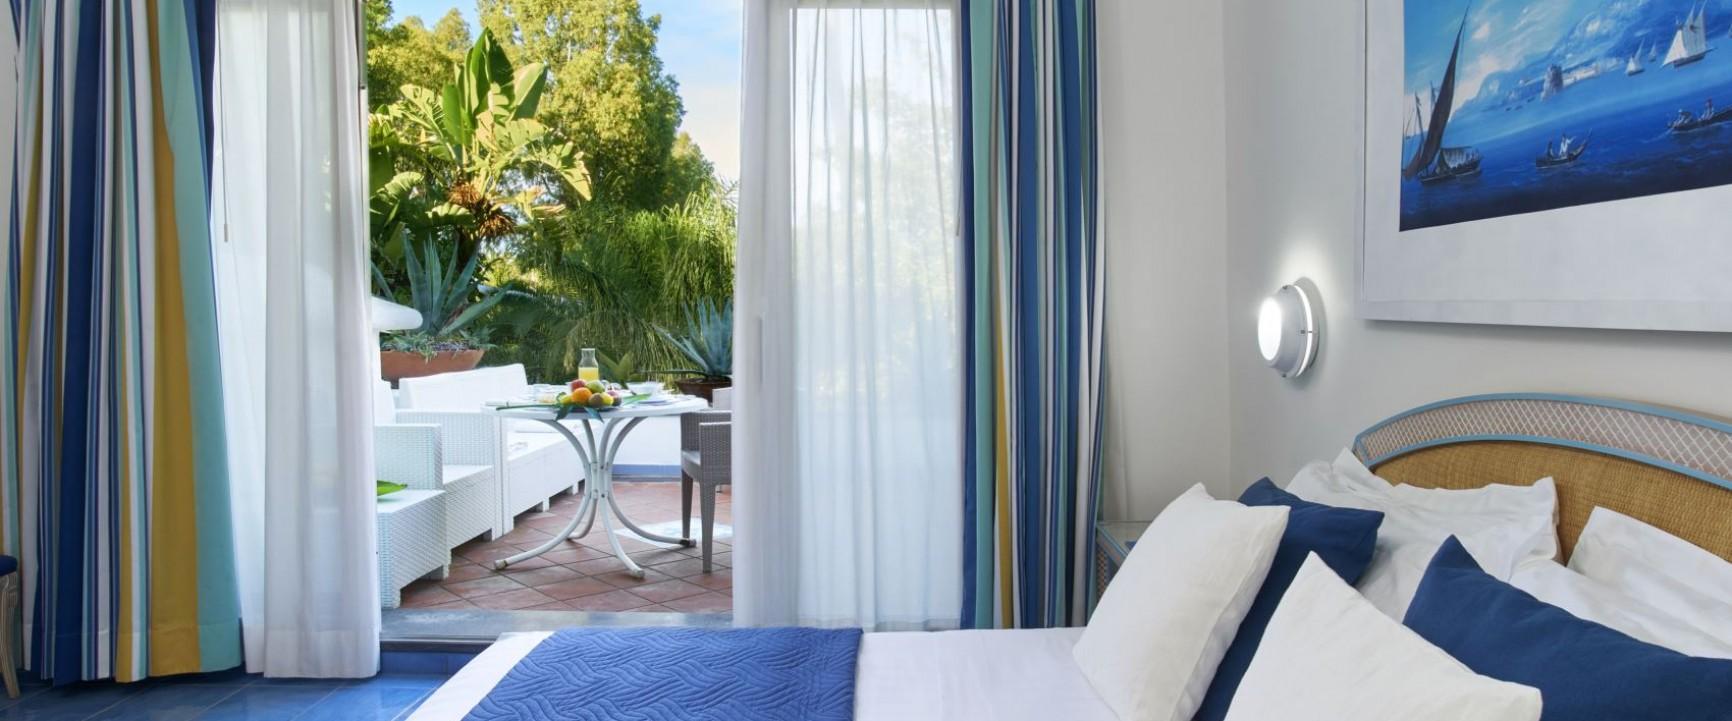 Hotel Terme Central Park